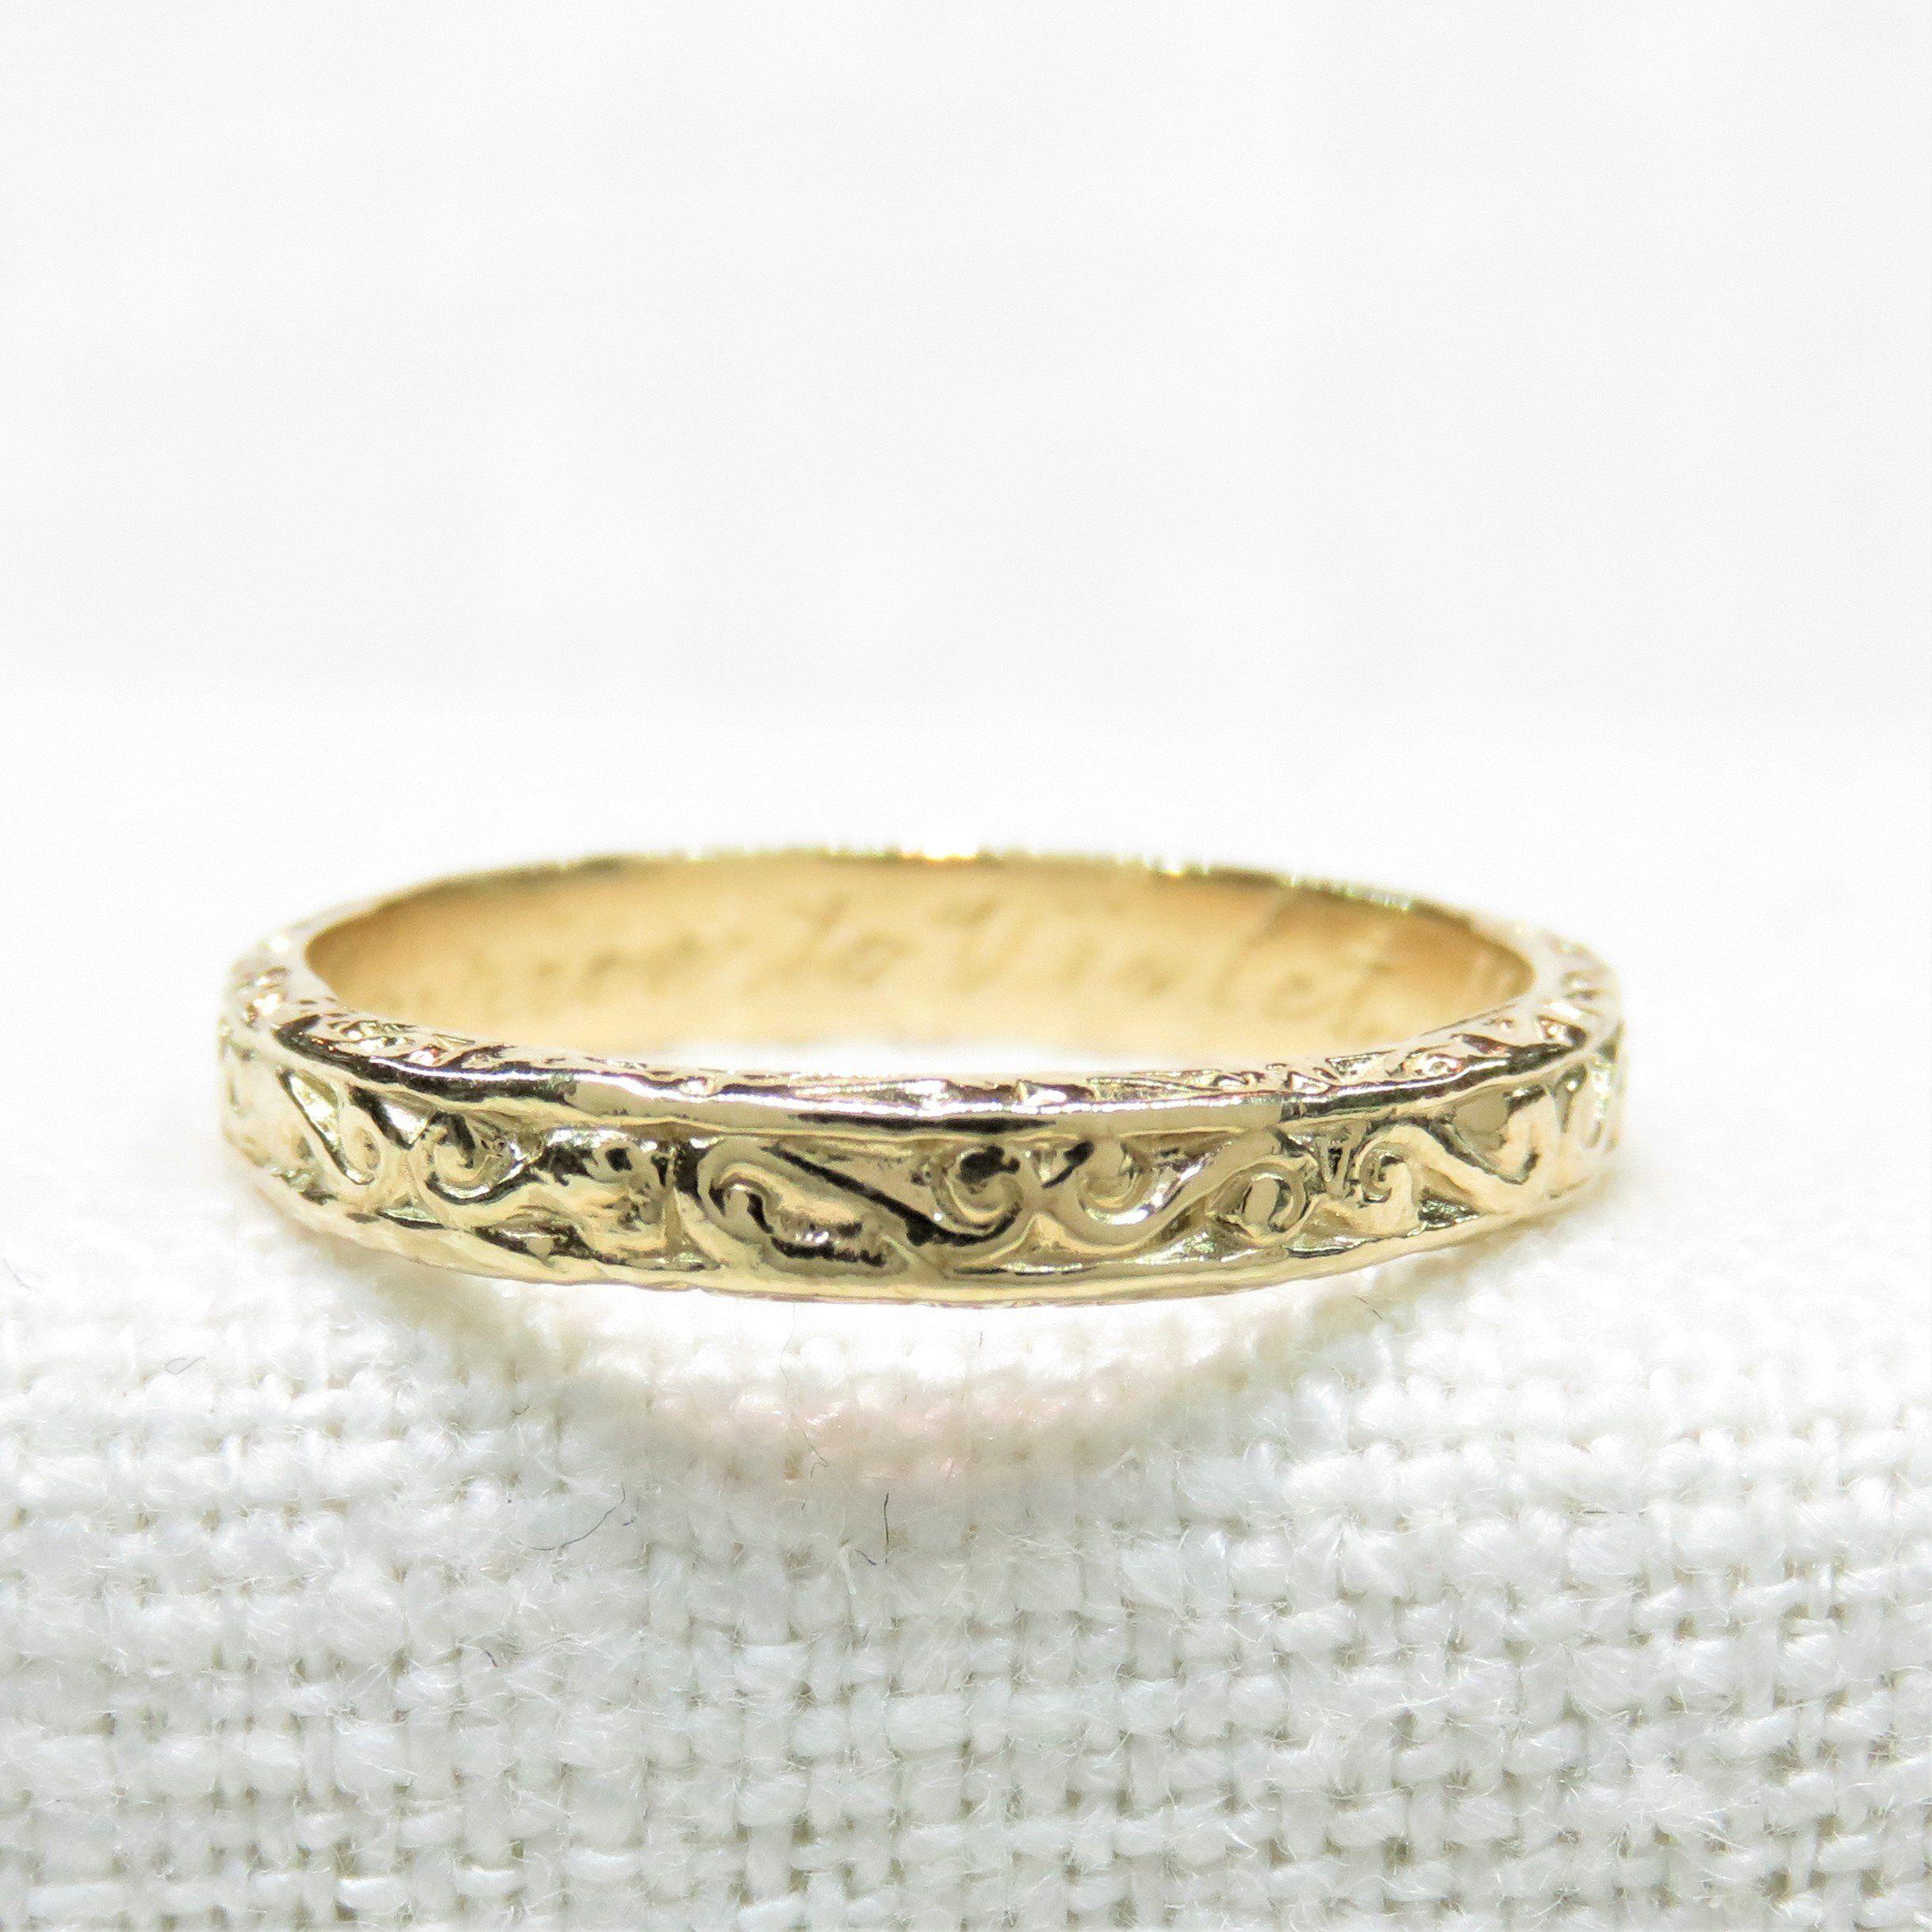 14k Gold Edwardian Wedding Ring Vintage Wedding Ring Vintage Wedding Band Engraved Weddi Edwardian Wedding Ring Engraved Wedding Rings Wedding Rings Vintage